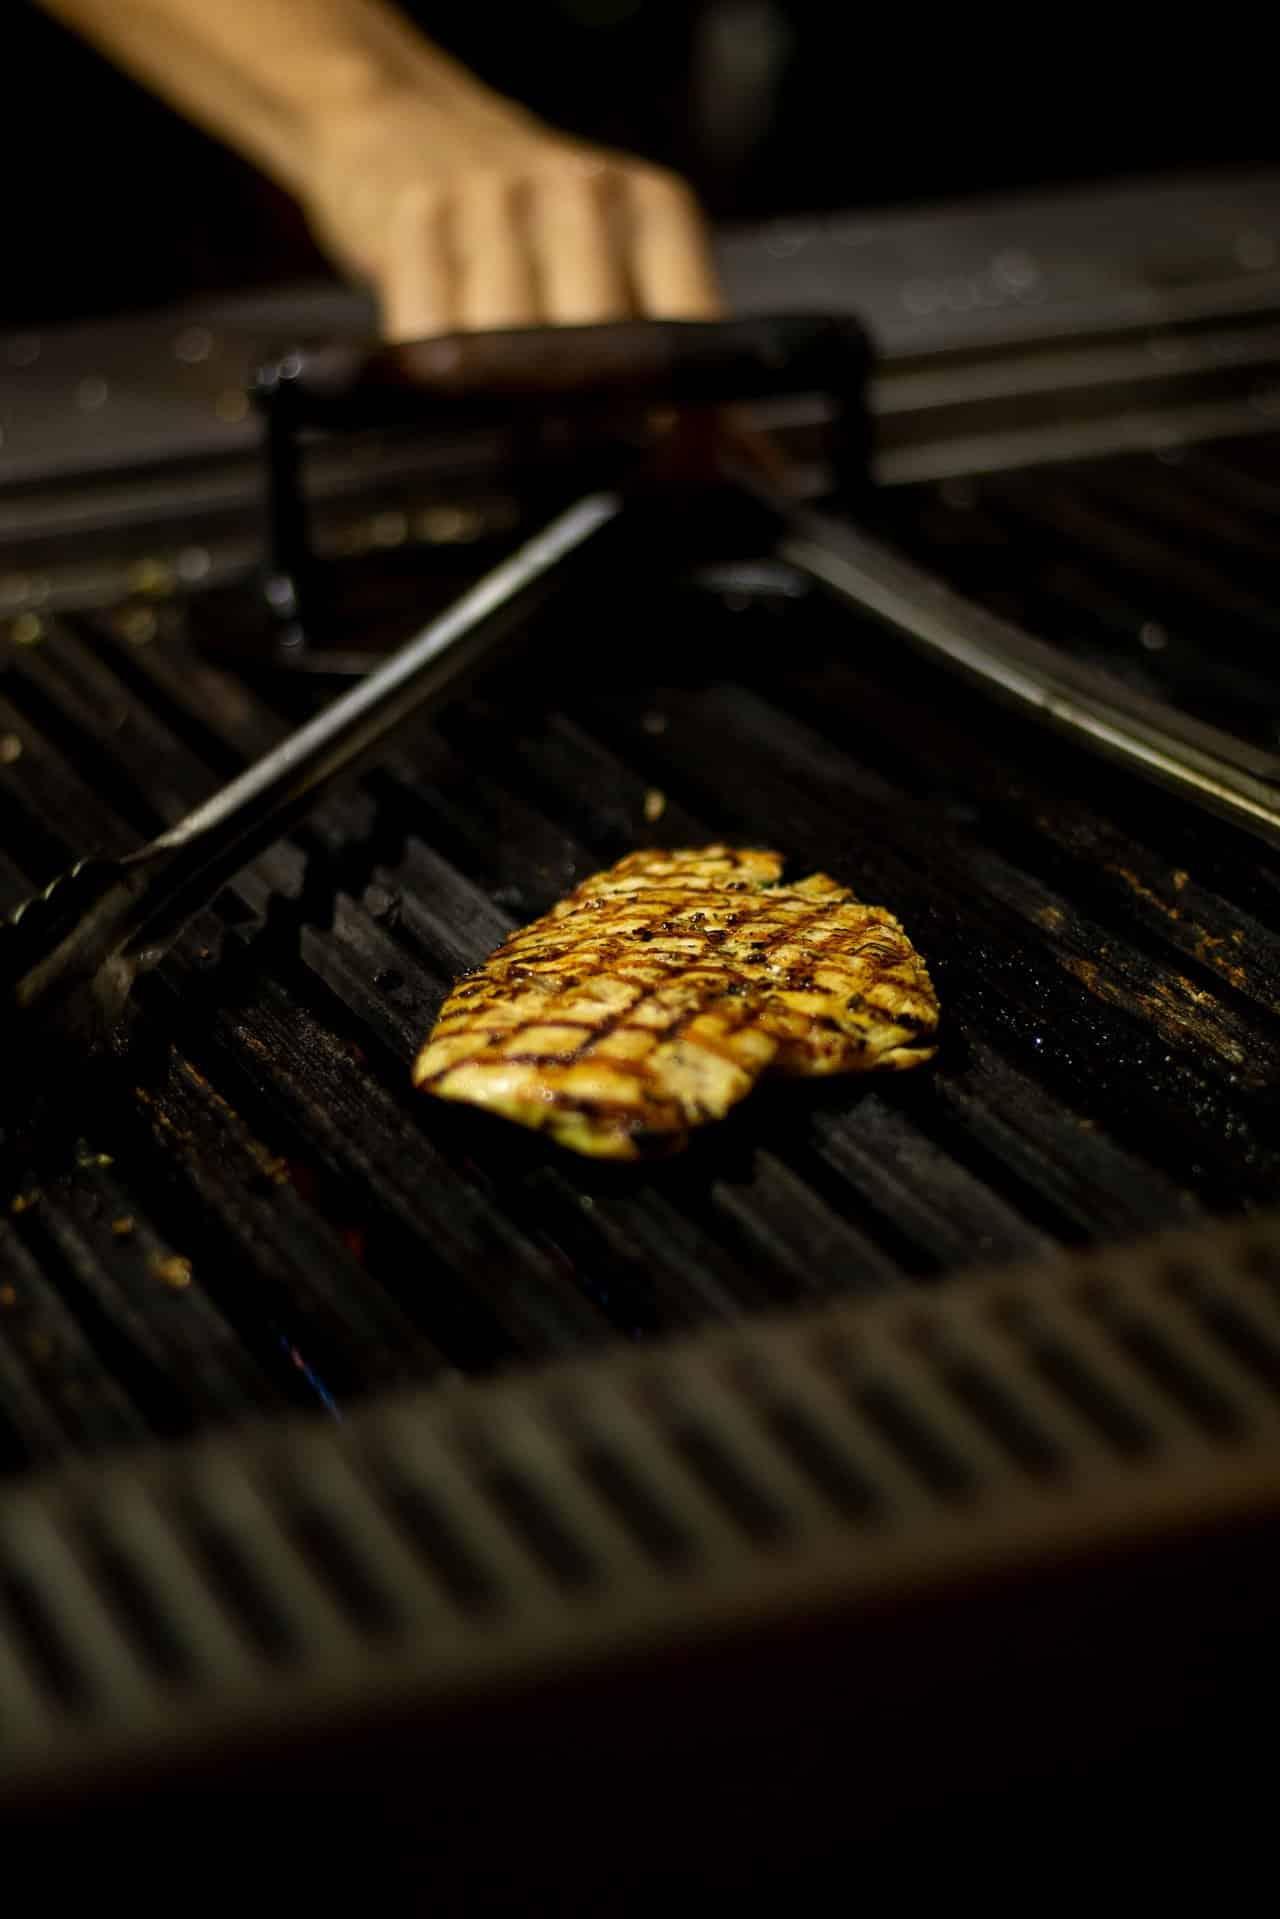 Grilovanie kuracieho mäsa